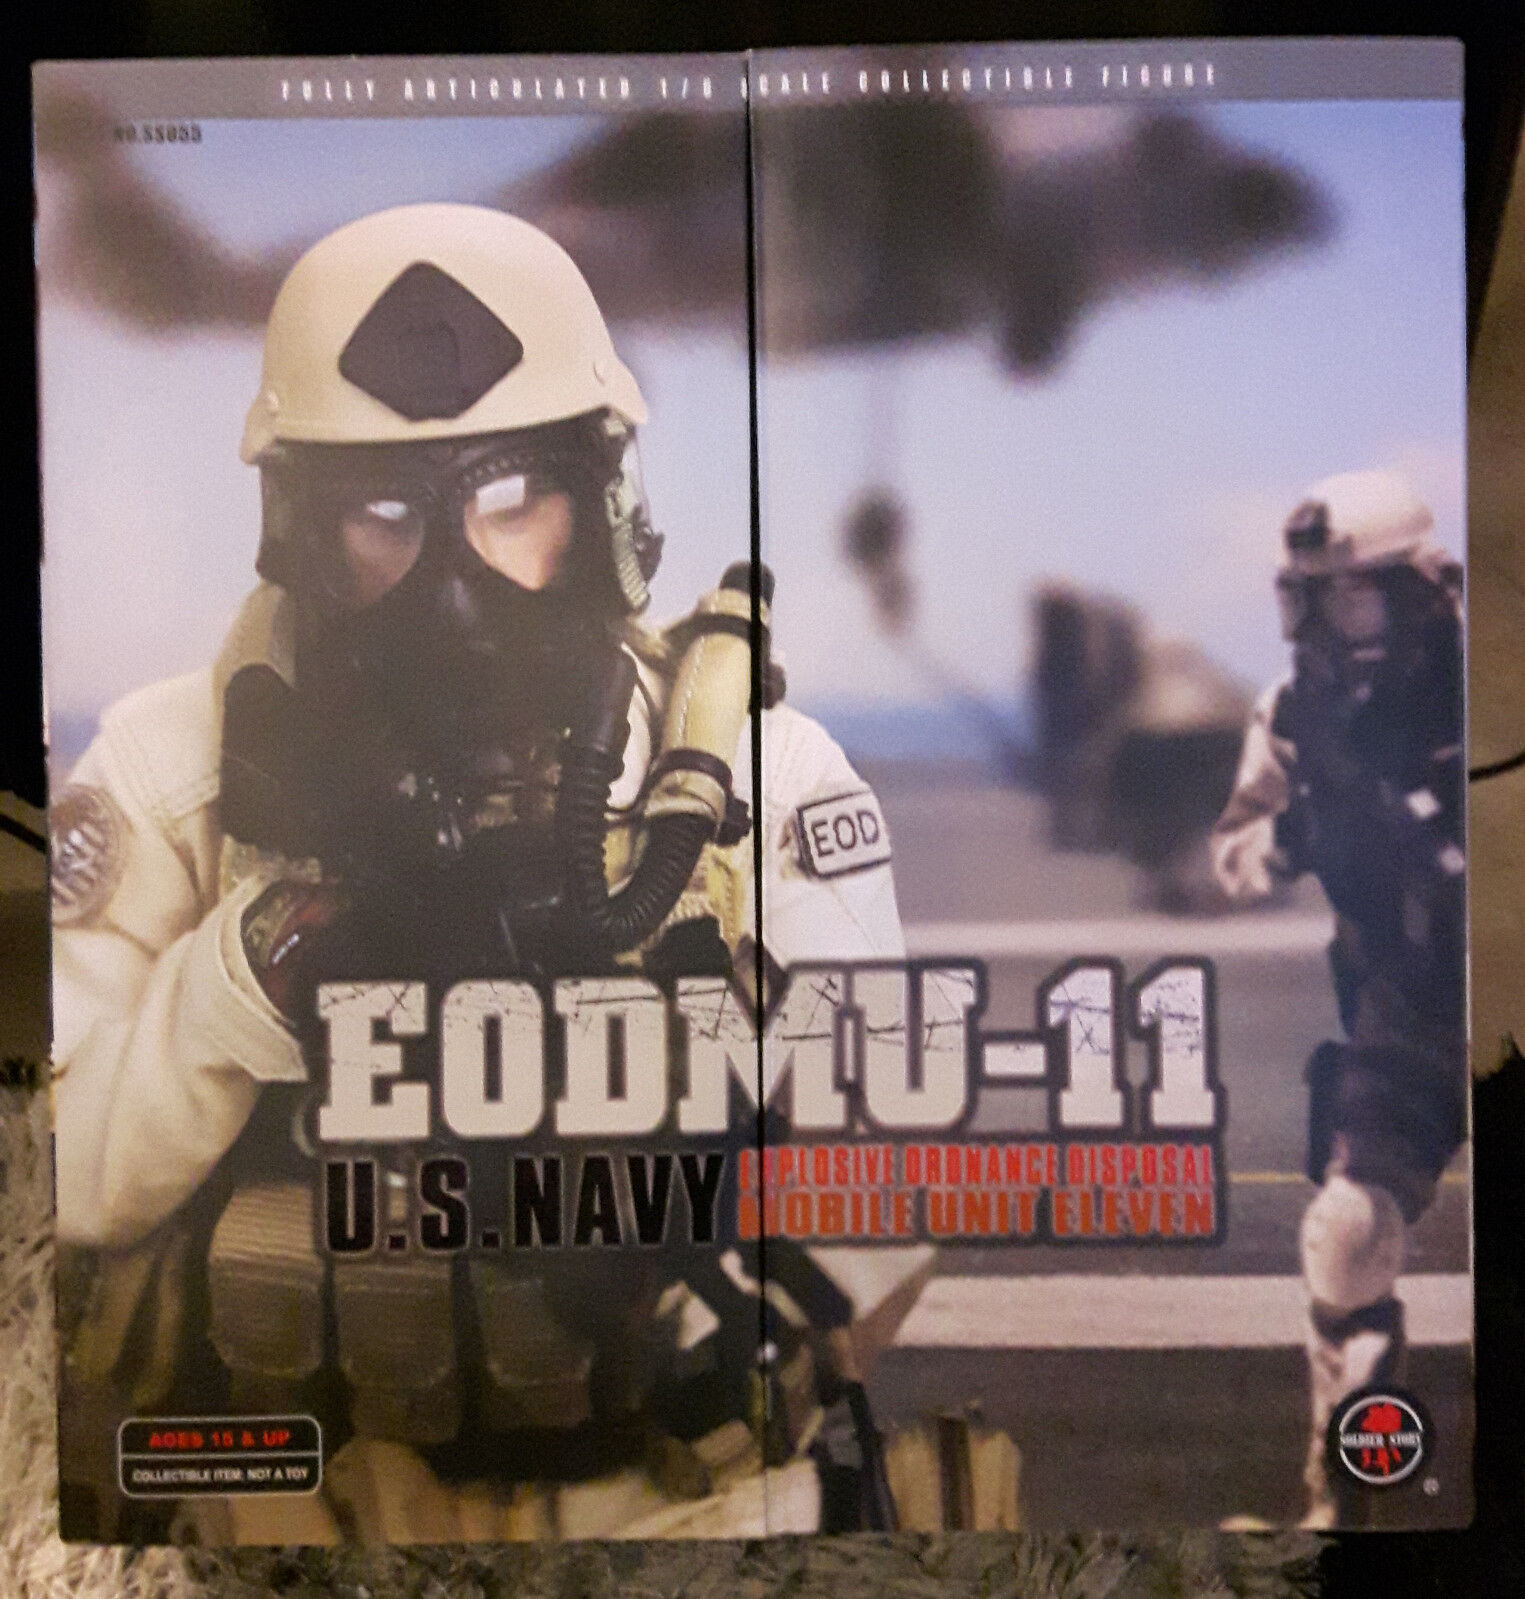 1 6 Scale Figure US Navy E0DMU-11 Explosive Oradance Disposal Mobile Unit 11